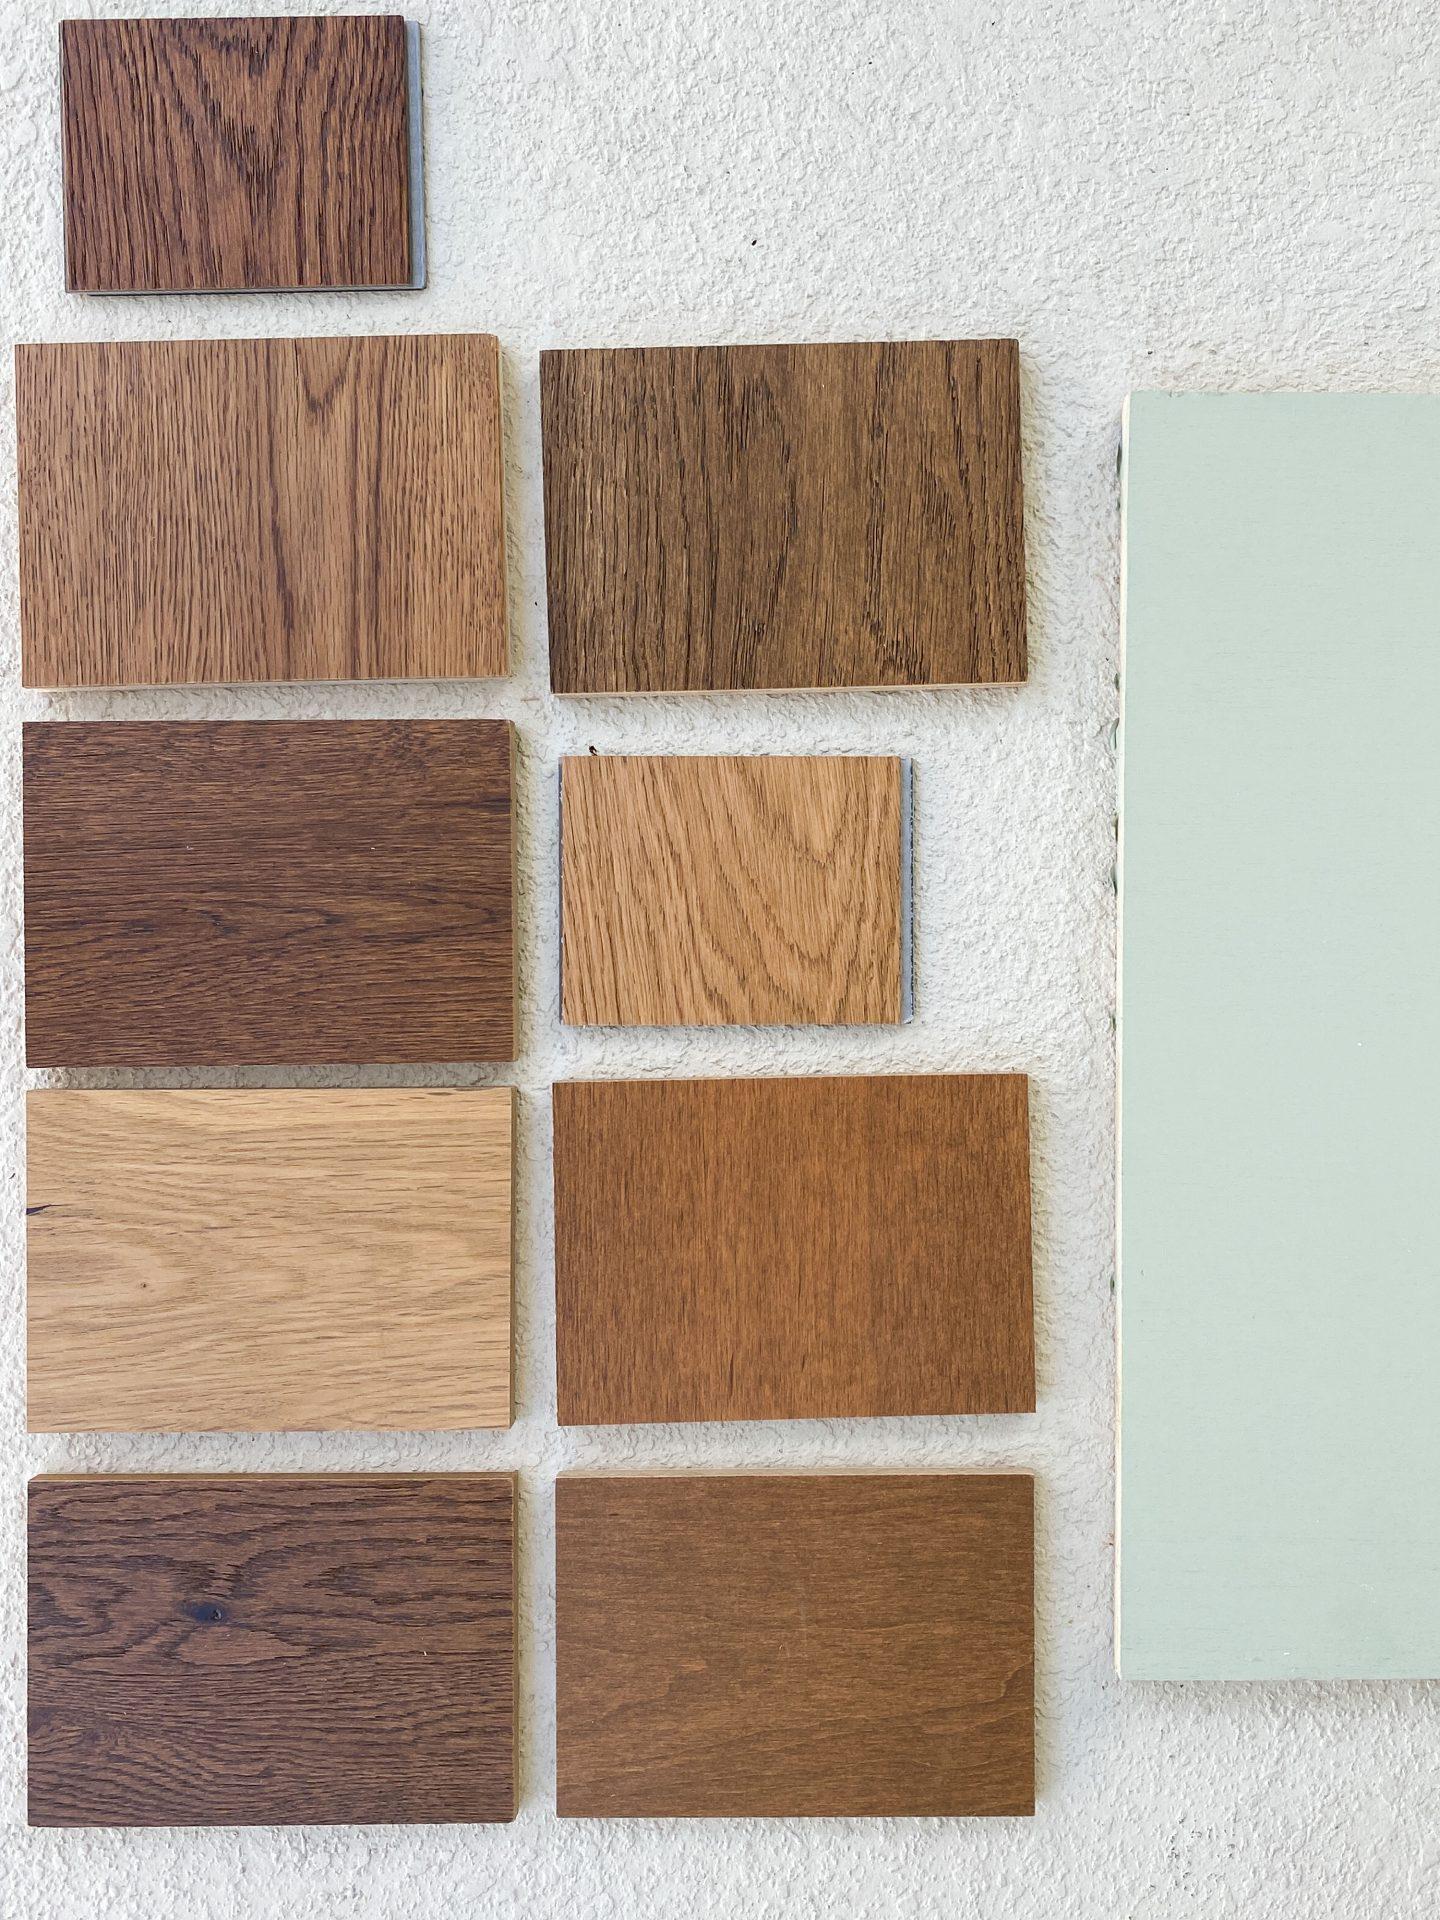 popular wood flooring color samples on ashleybrookedesigns.com